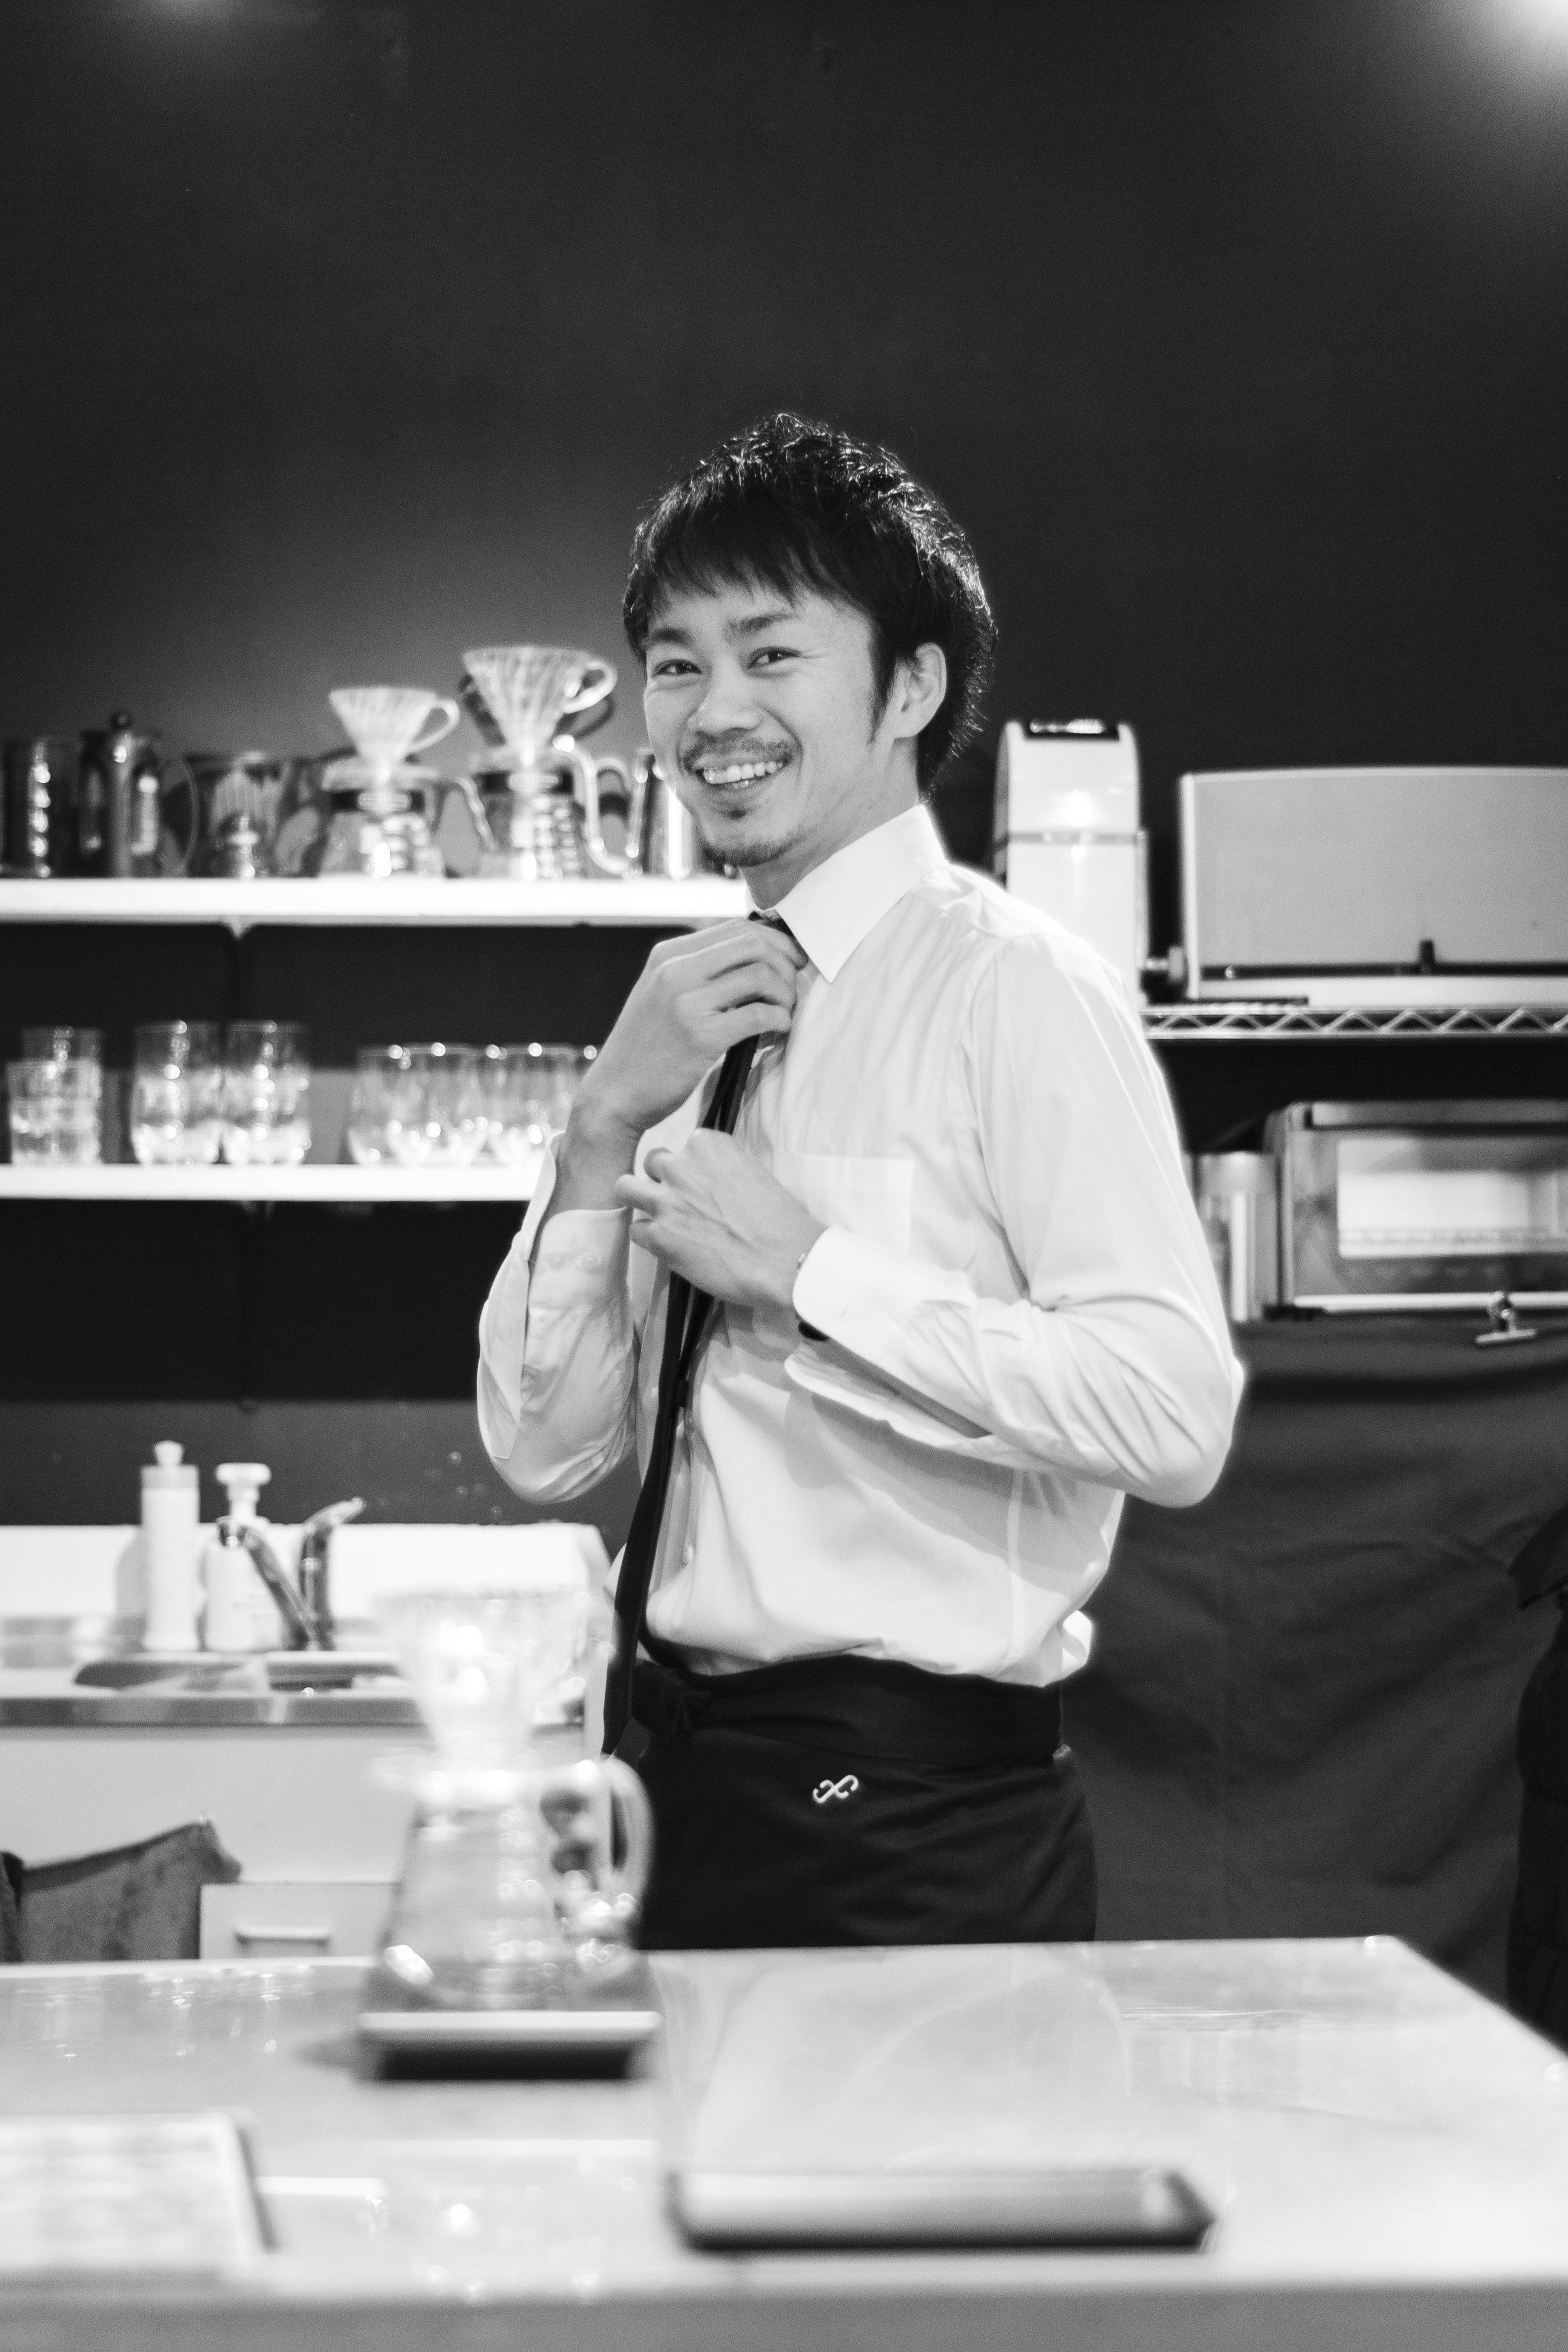 Coffee LABO frank / 北島 宏祐